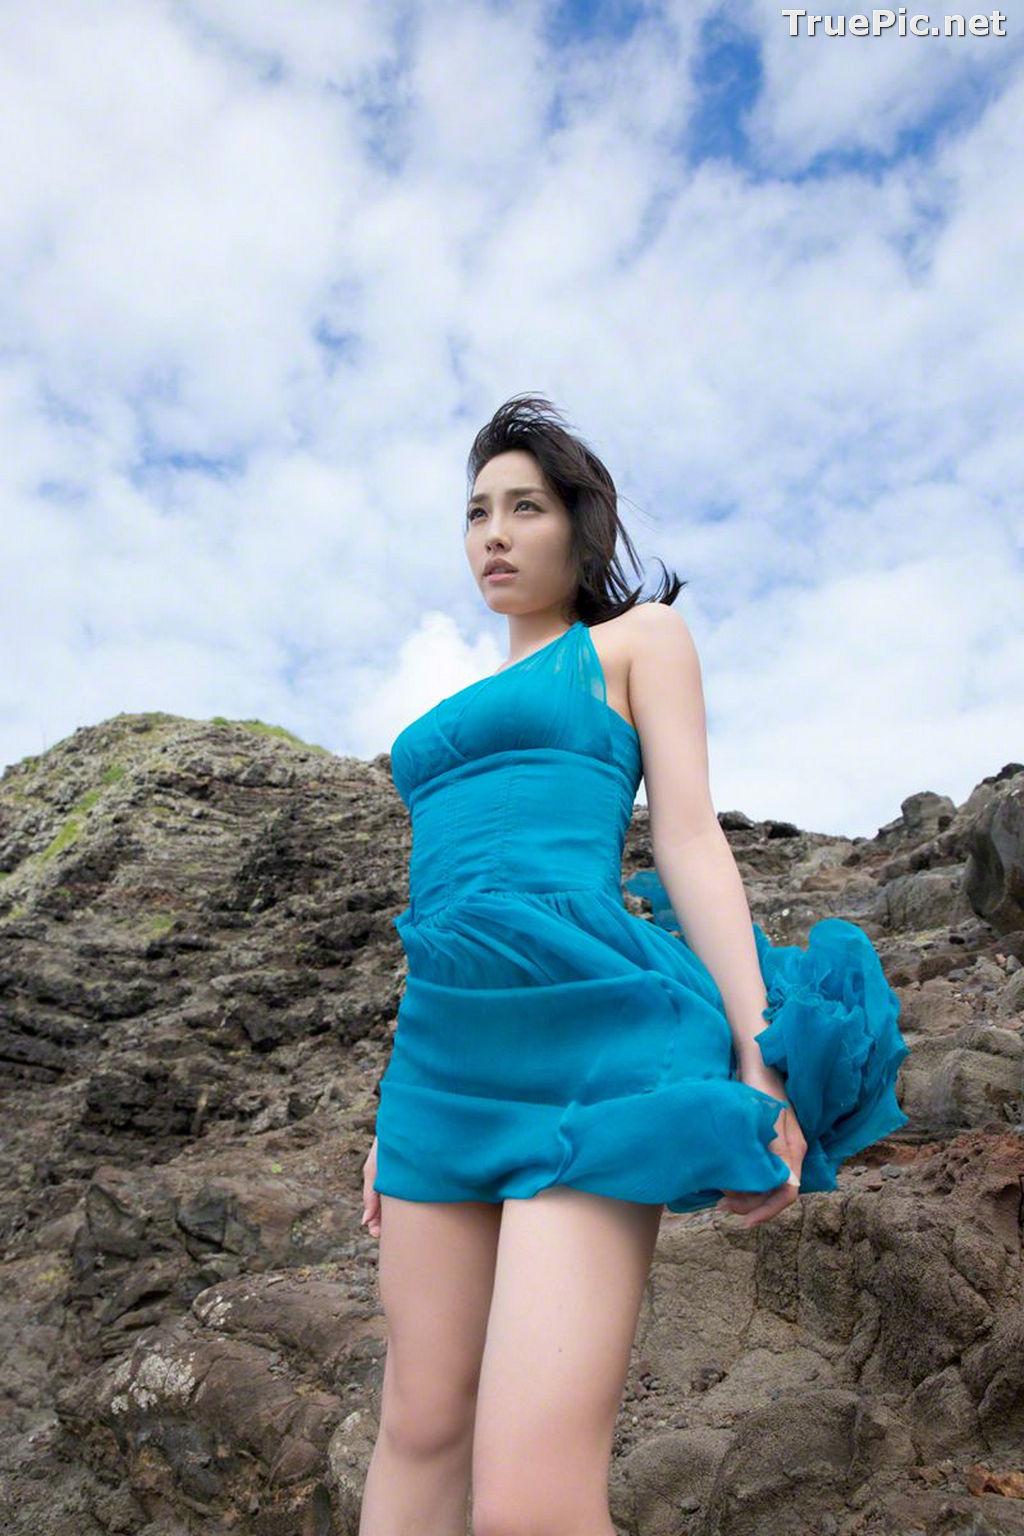 Image Wanibooks No.127 - Japanese Gravure Idol and Actress - Anna Konno - TruePic.net - Picture-6